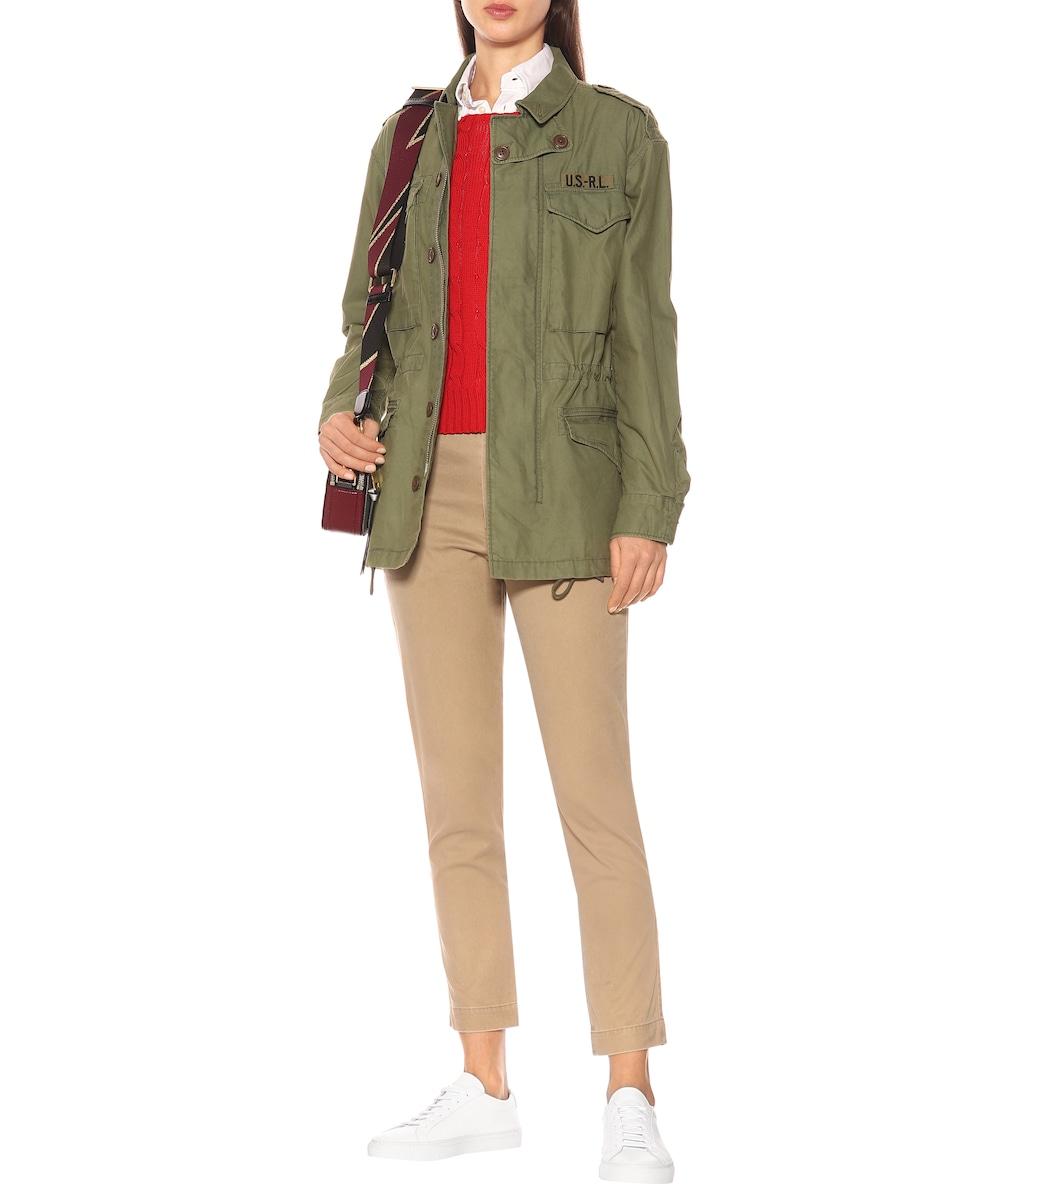 b4e45f72b Cotton Twill Military Jacket - Polo Ralph Lauren